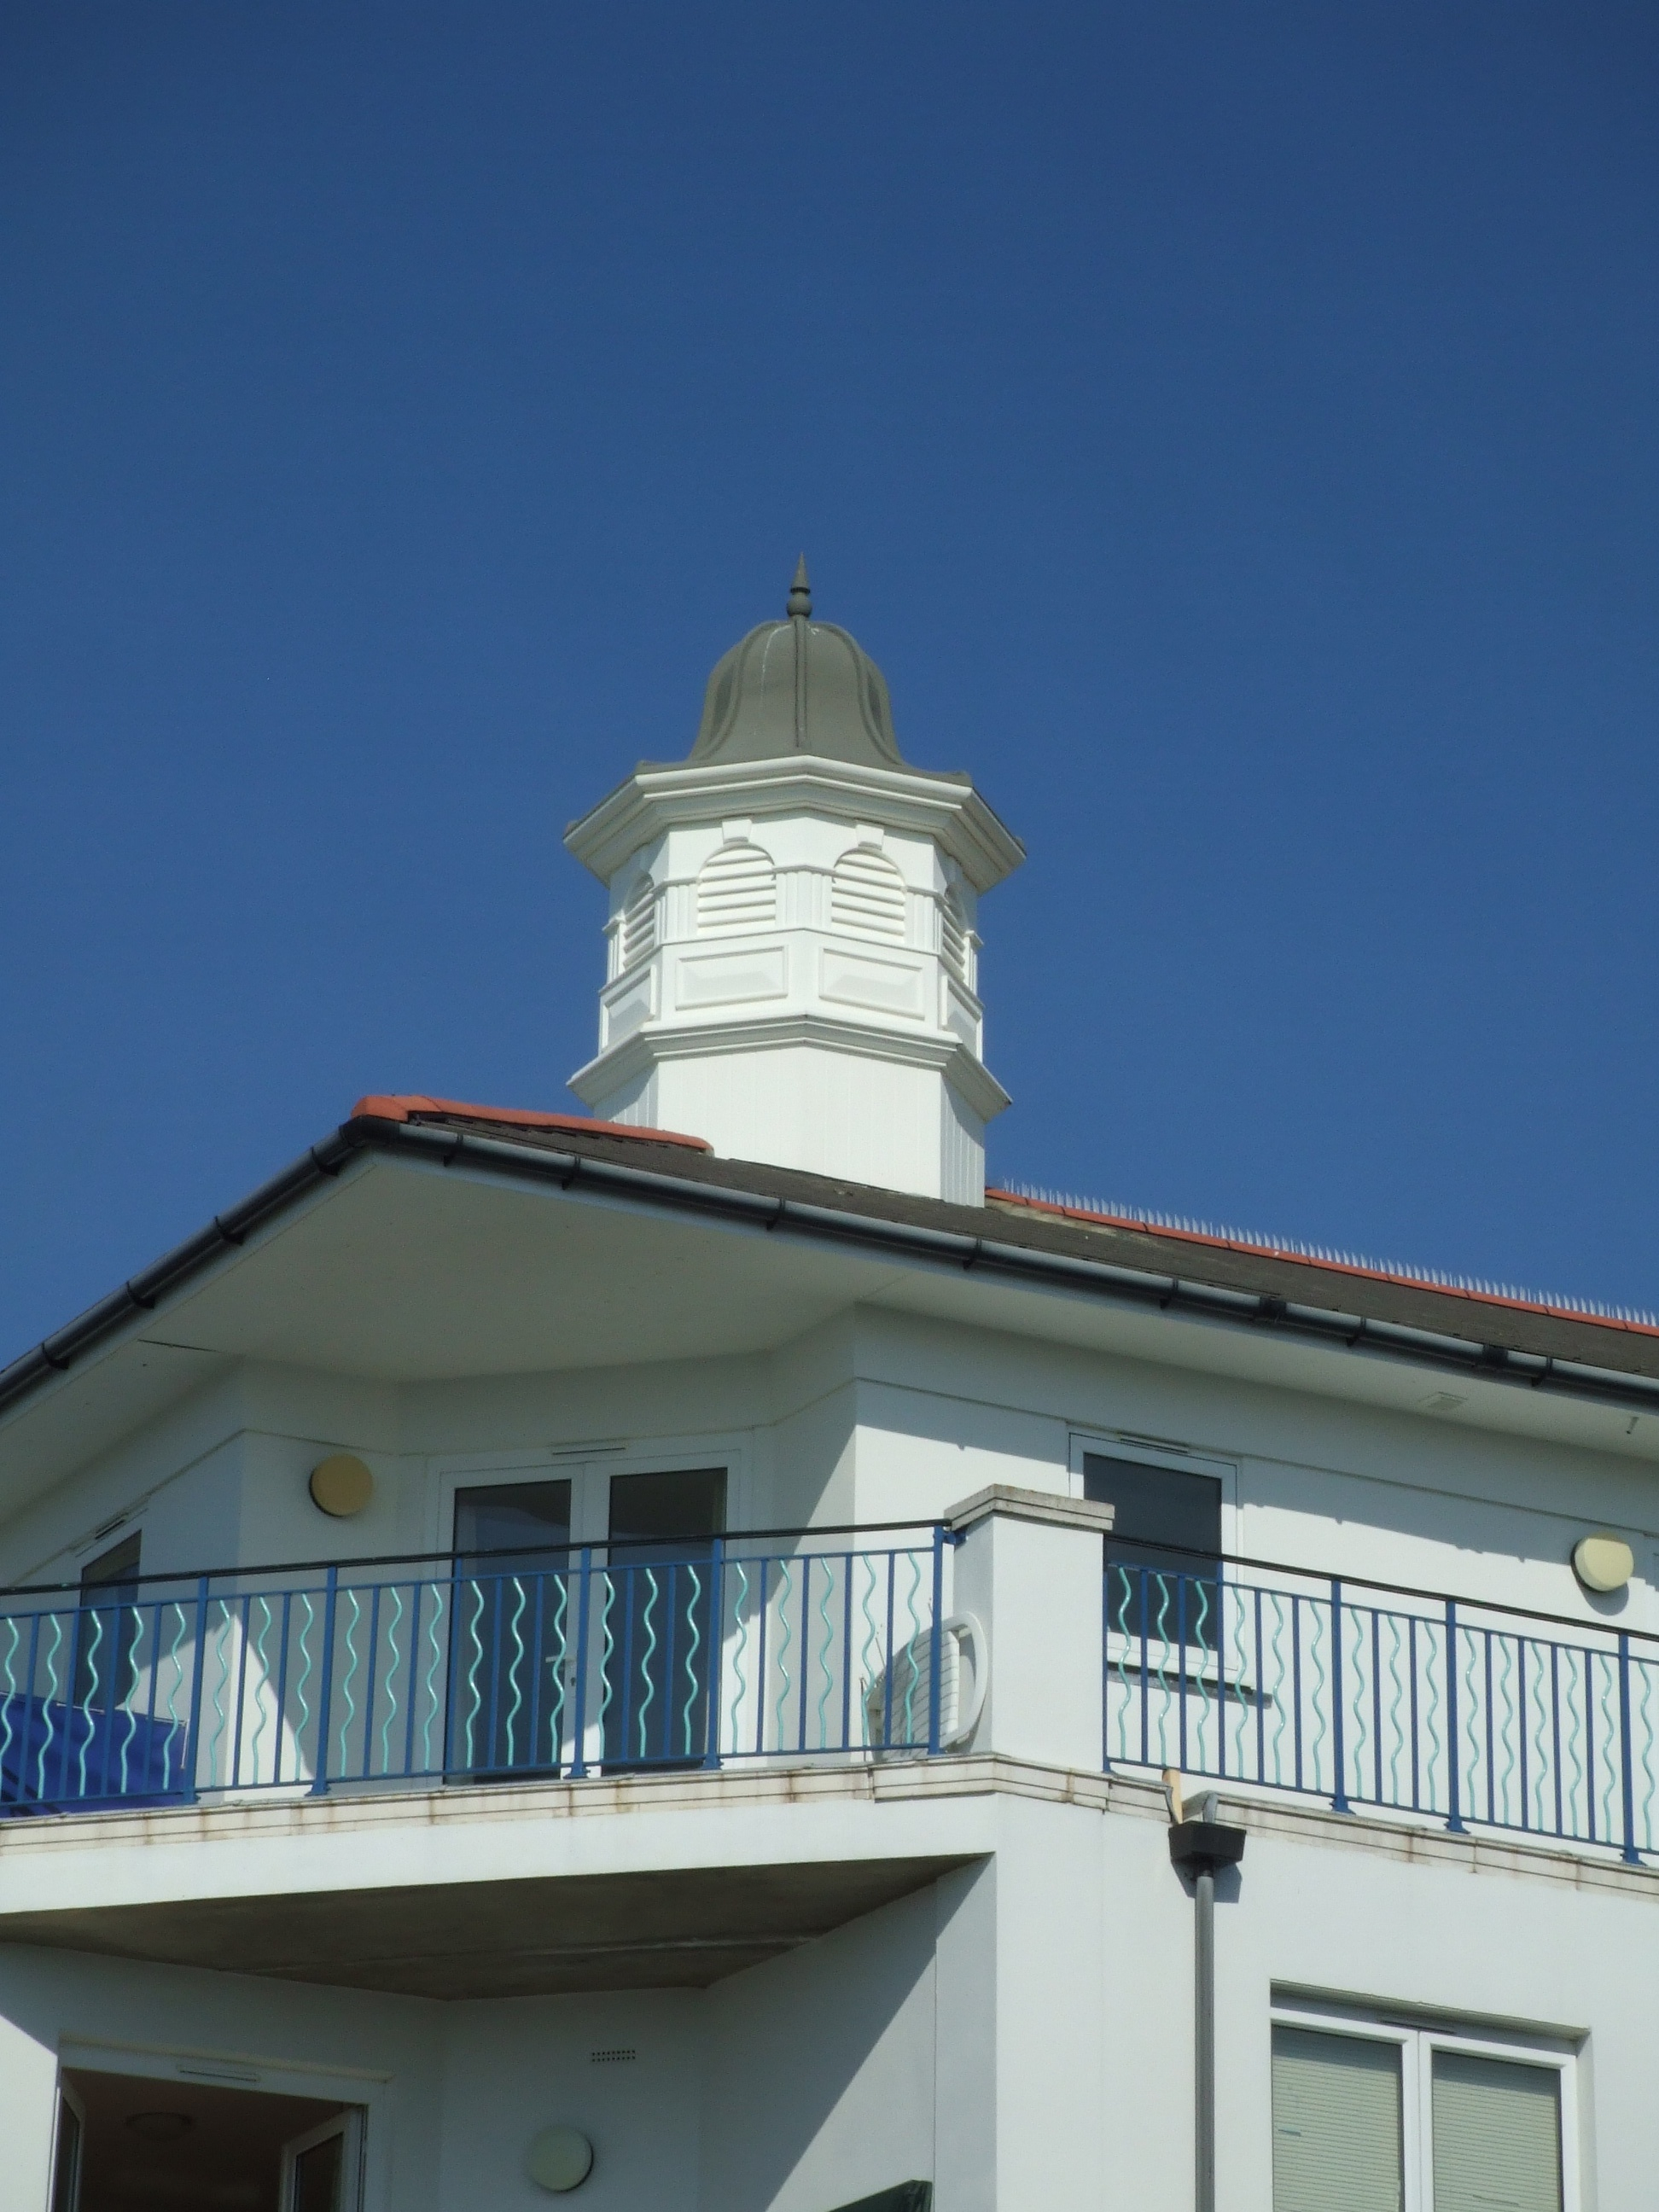 Eight sided cupolas